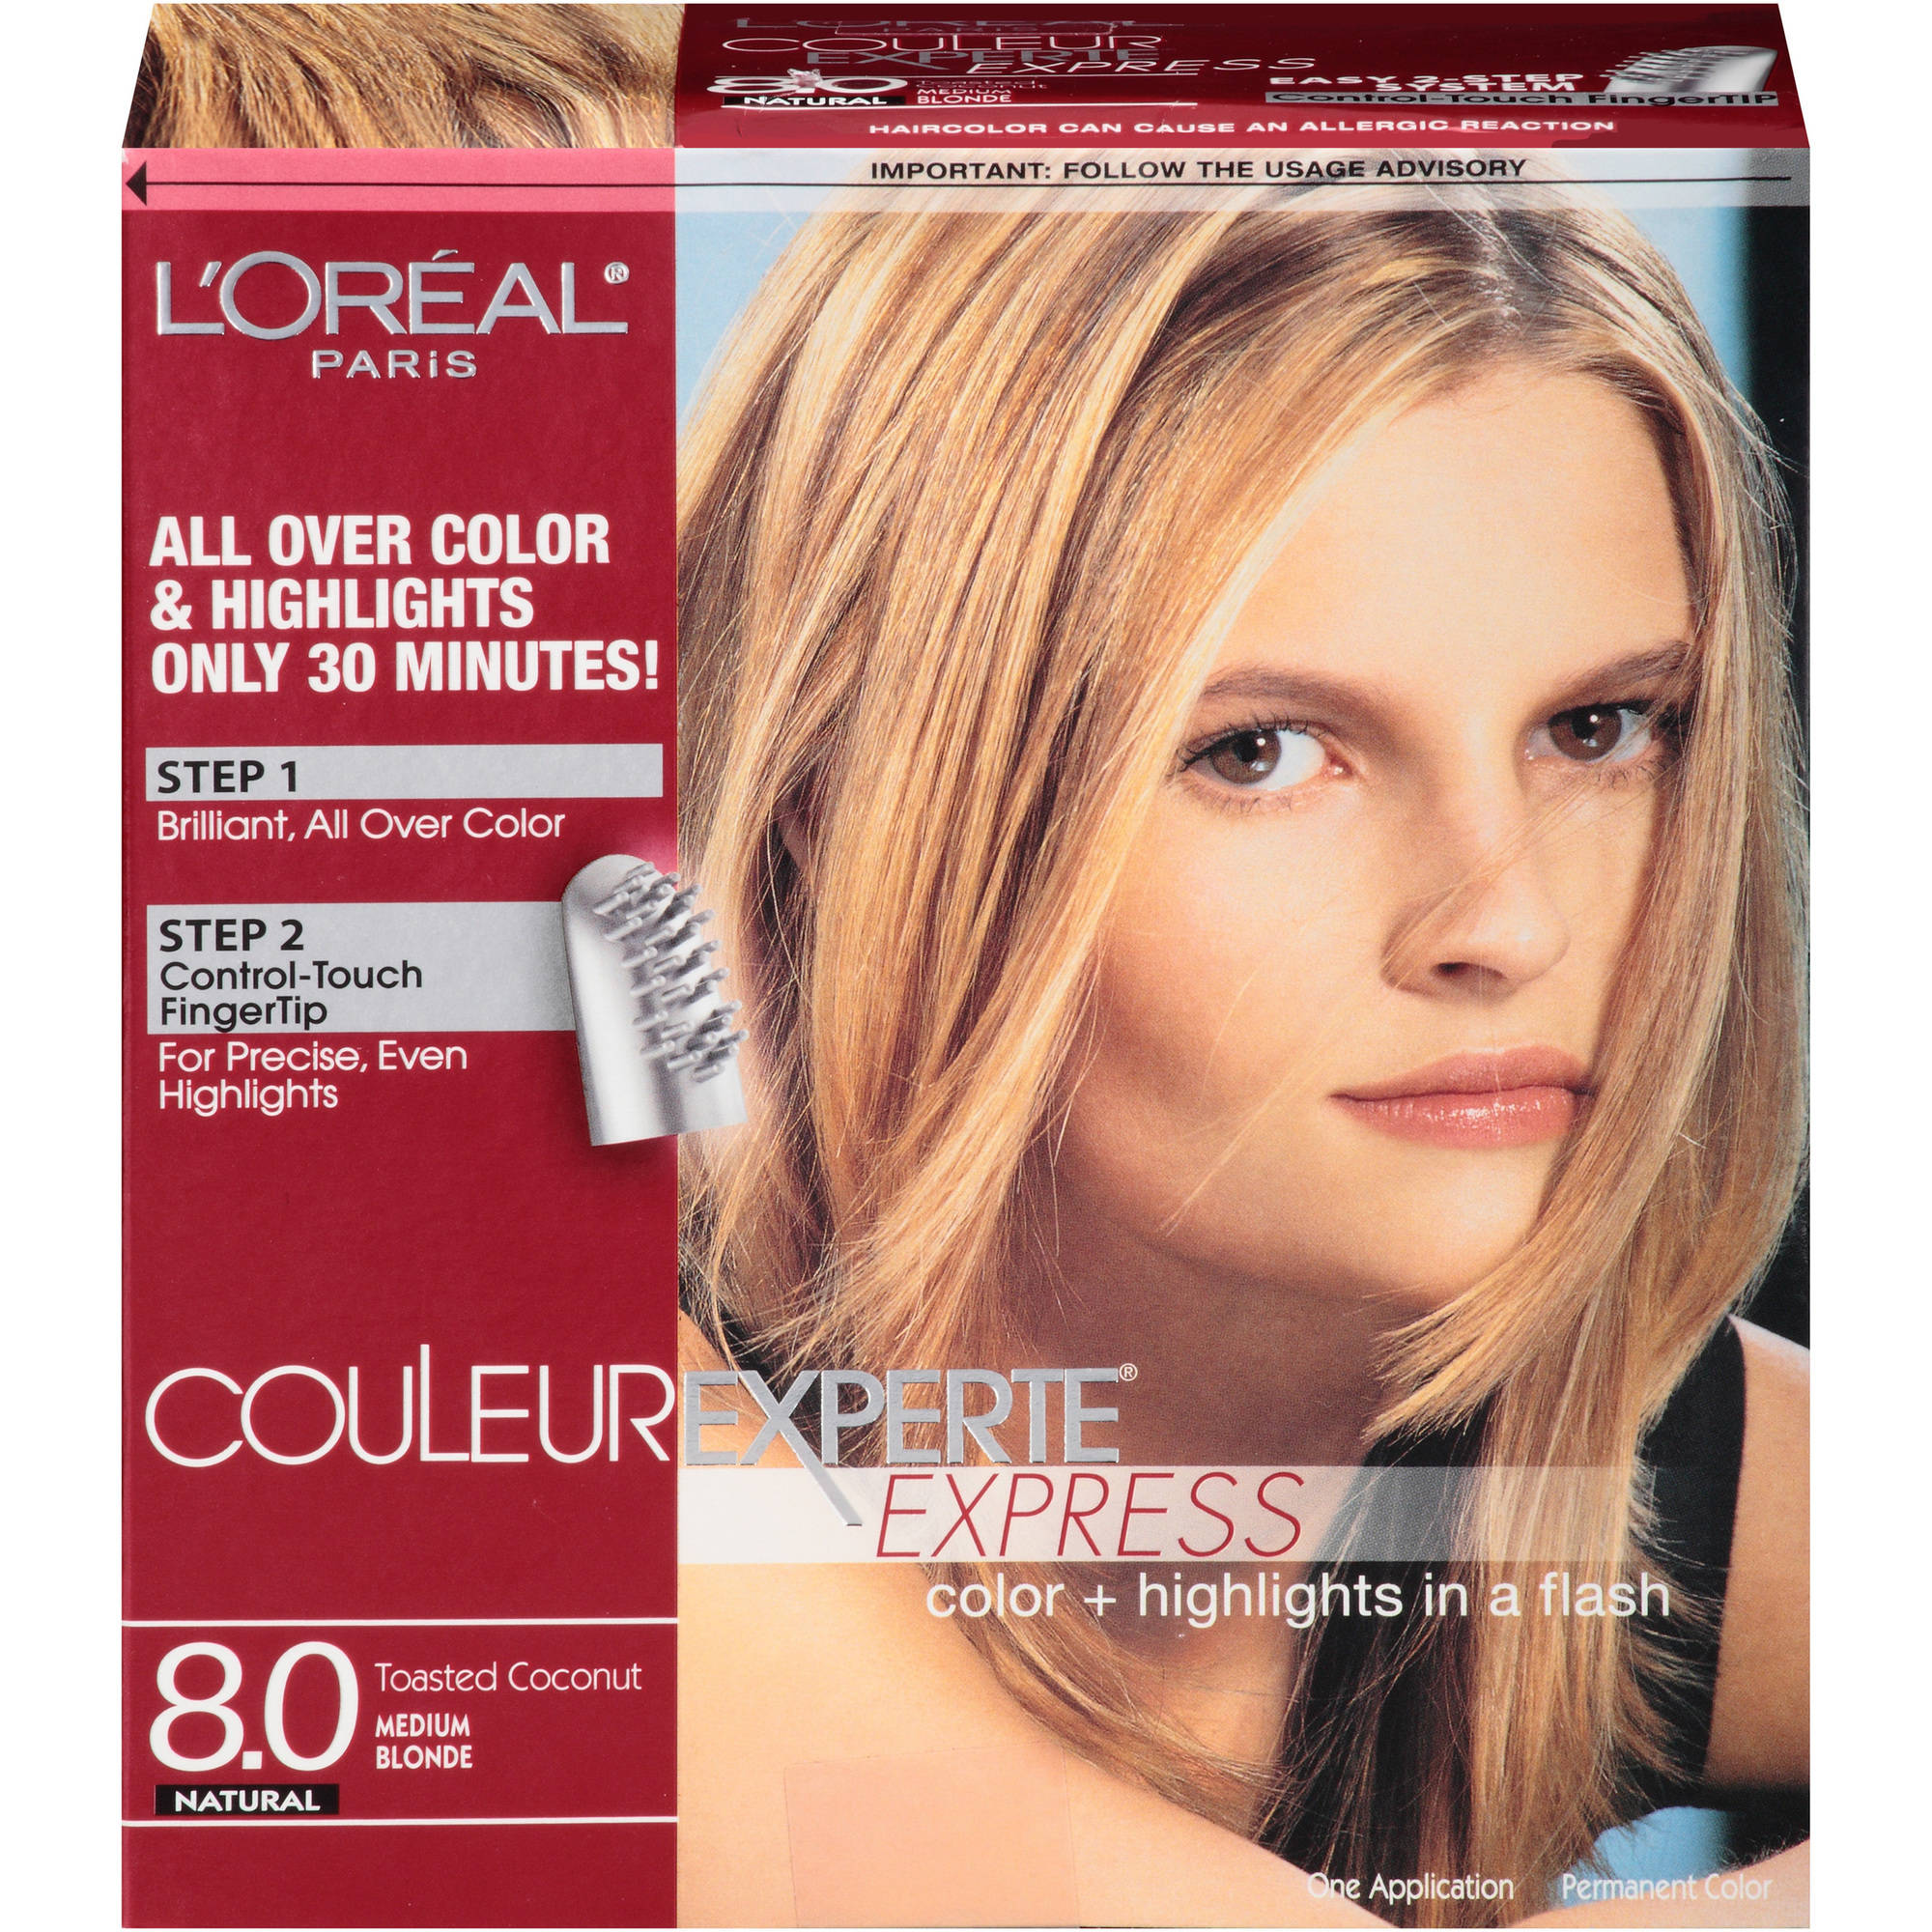 L'Oreal Paris Couleur Experte Express Natural Hair Color Kit, 8.0 Toasted Coconut Medium Blonde